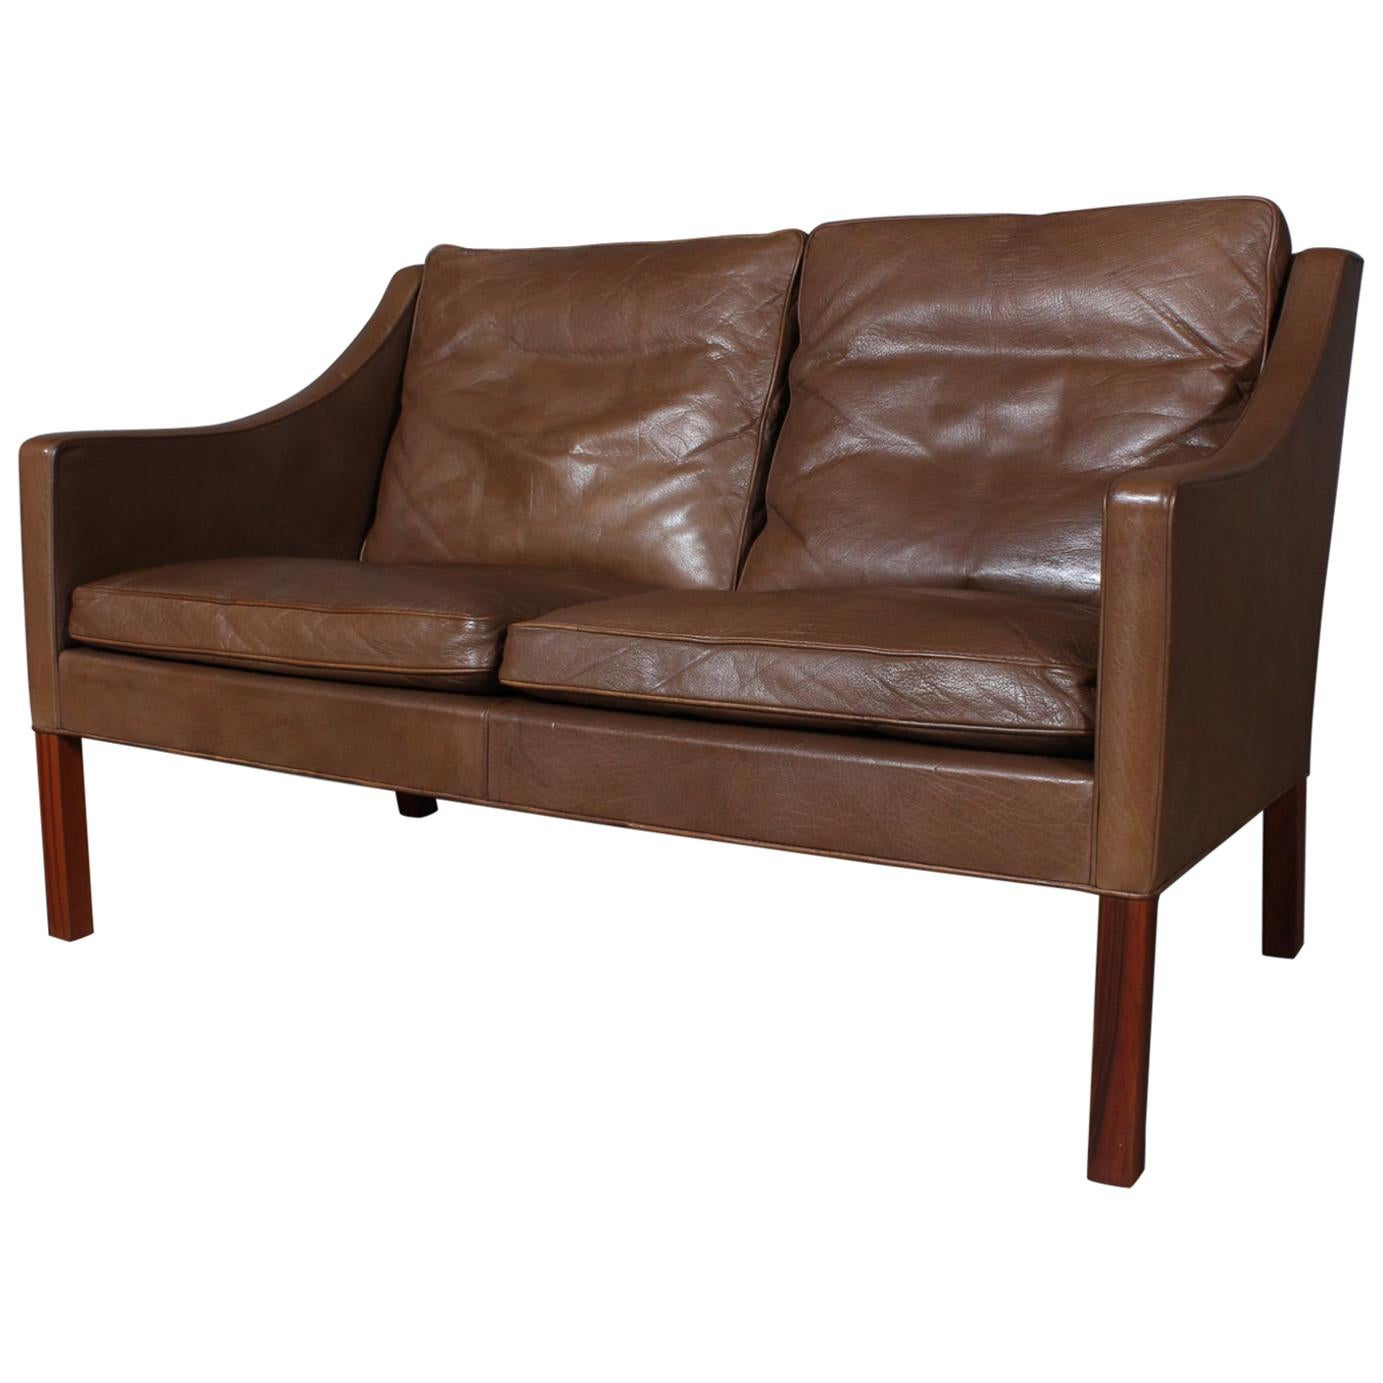 Børge Mogensen Two-Seat Sofa, Model 2208, Original Brown Leather